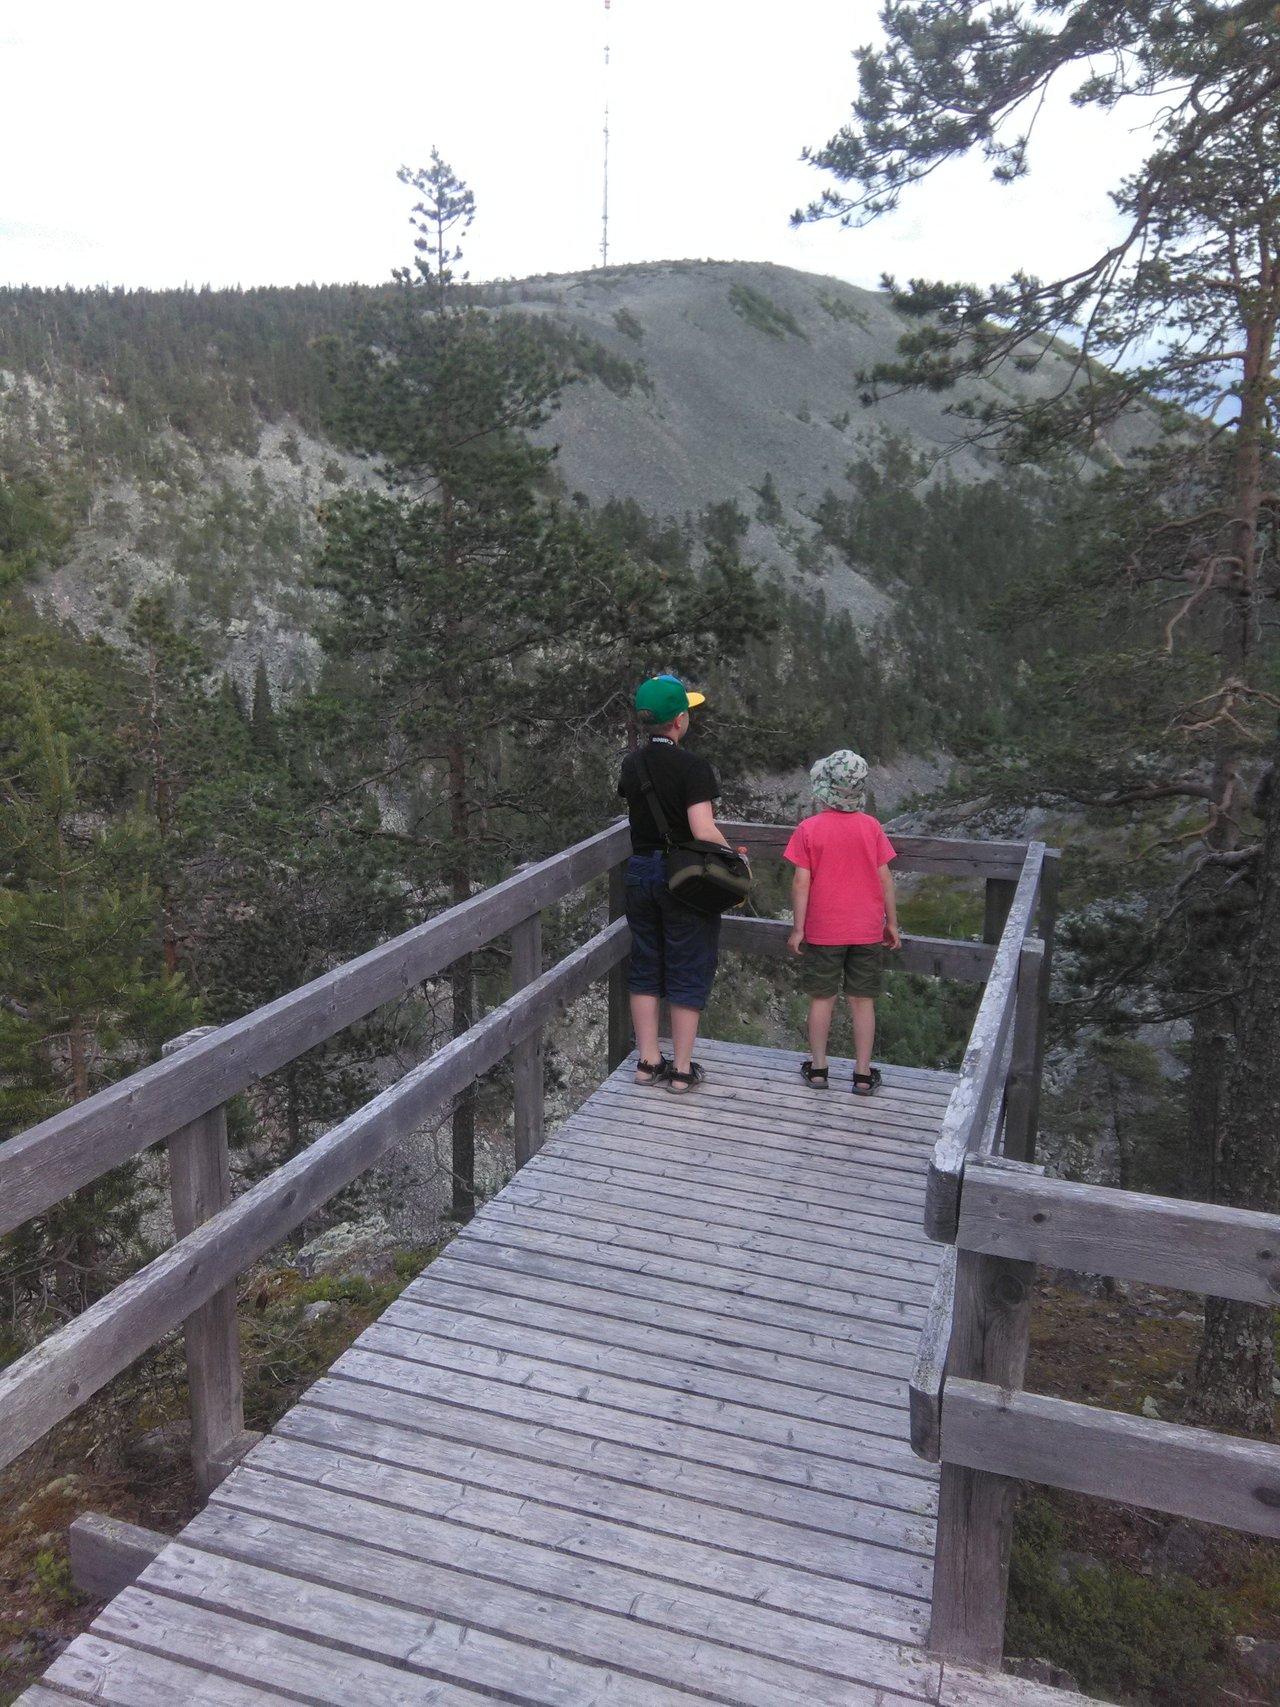 Our hiking trip to Karhunjuomalampi in Pyhätunturi, Lapland.